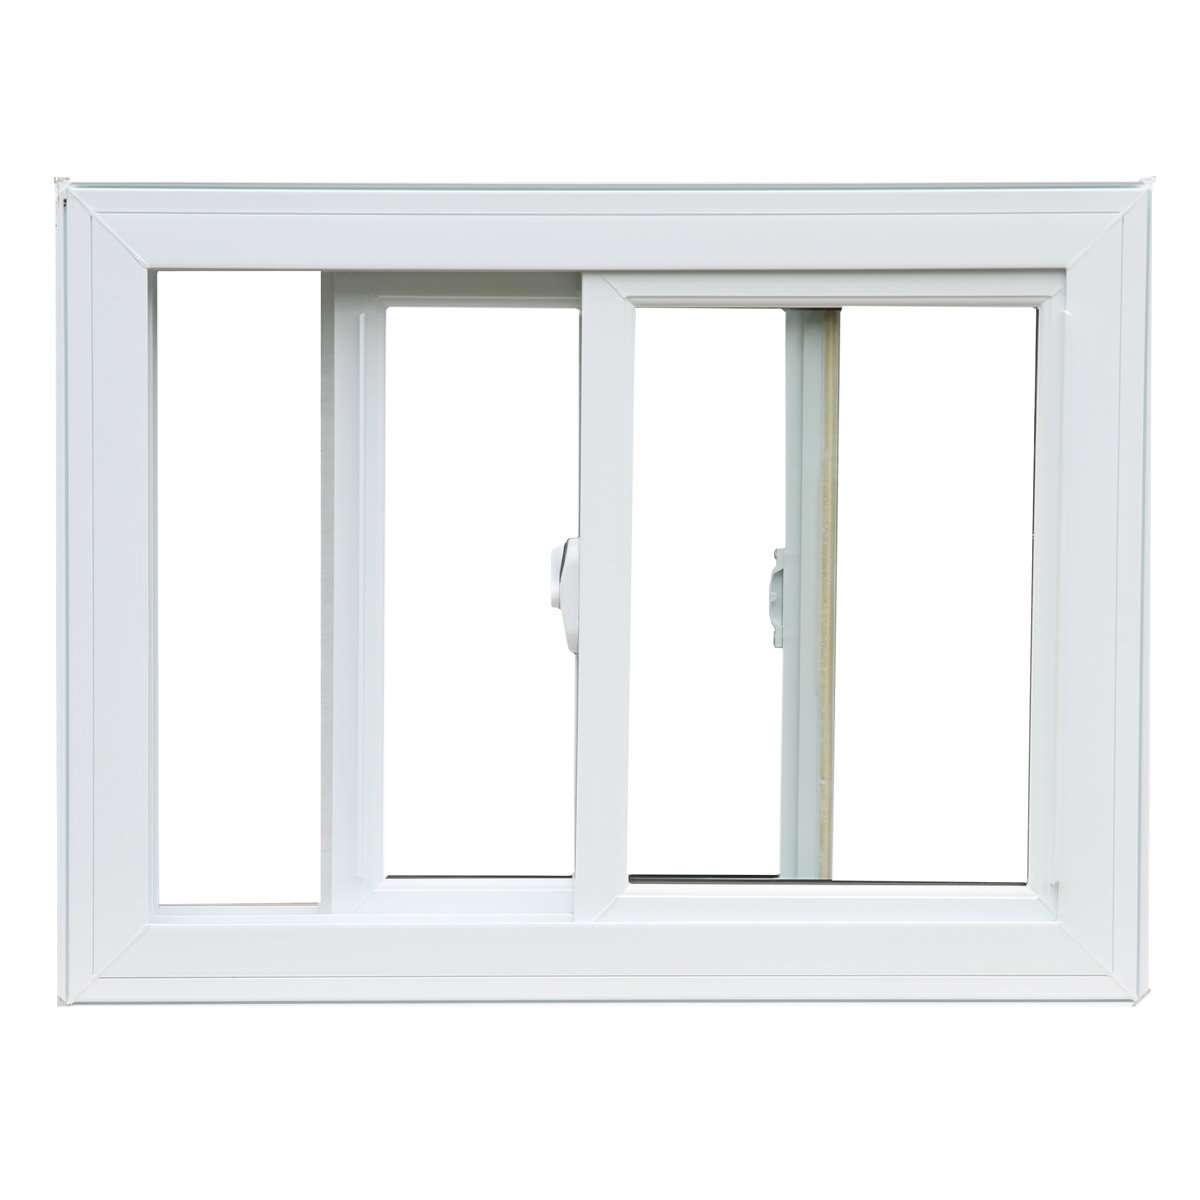 An open white sliding window